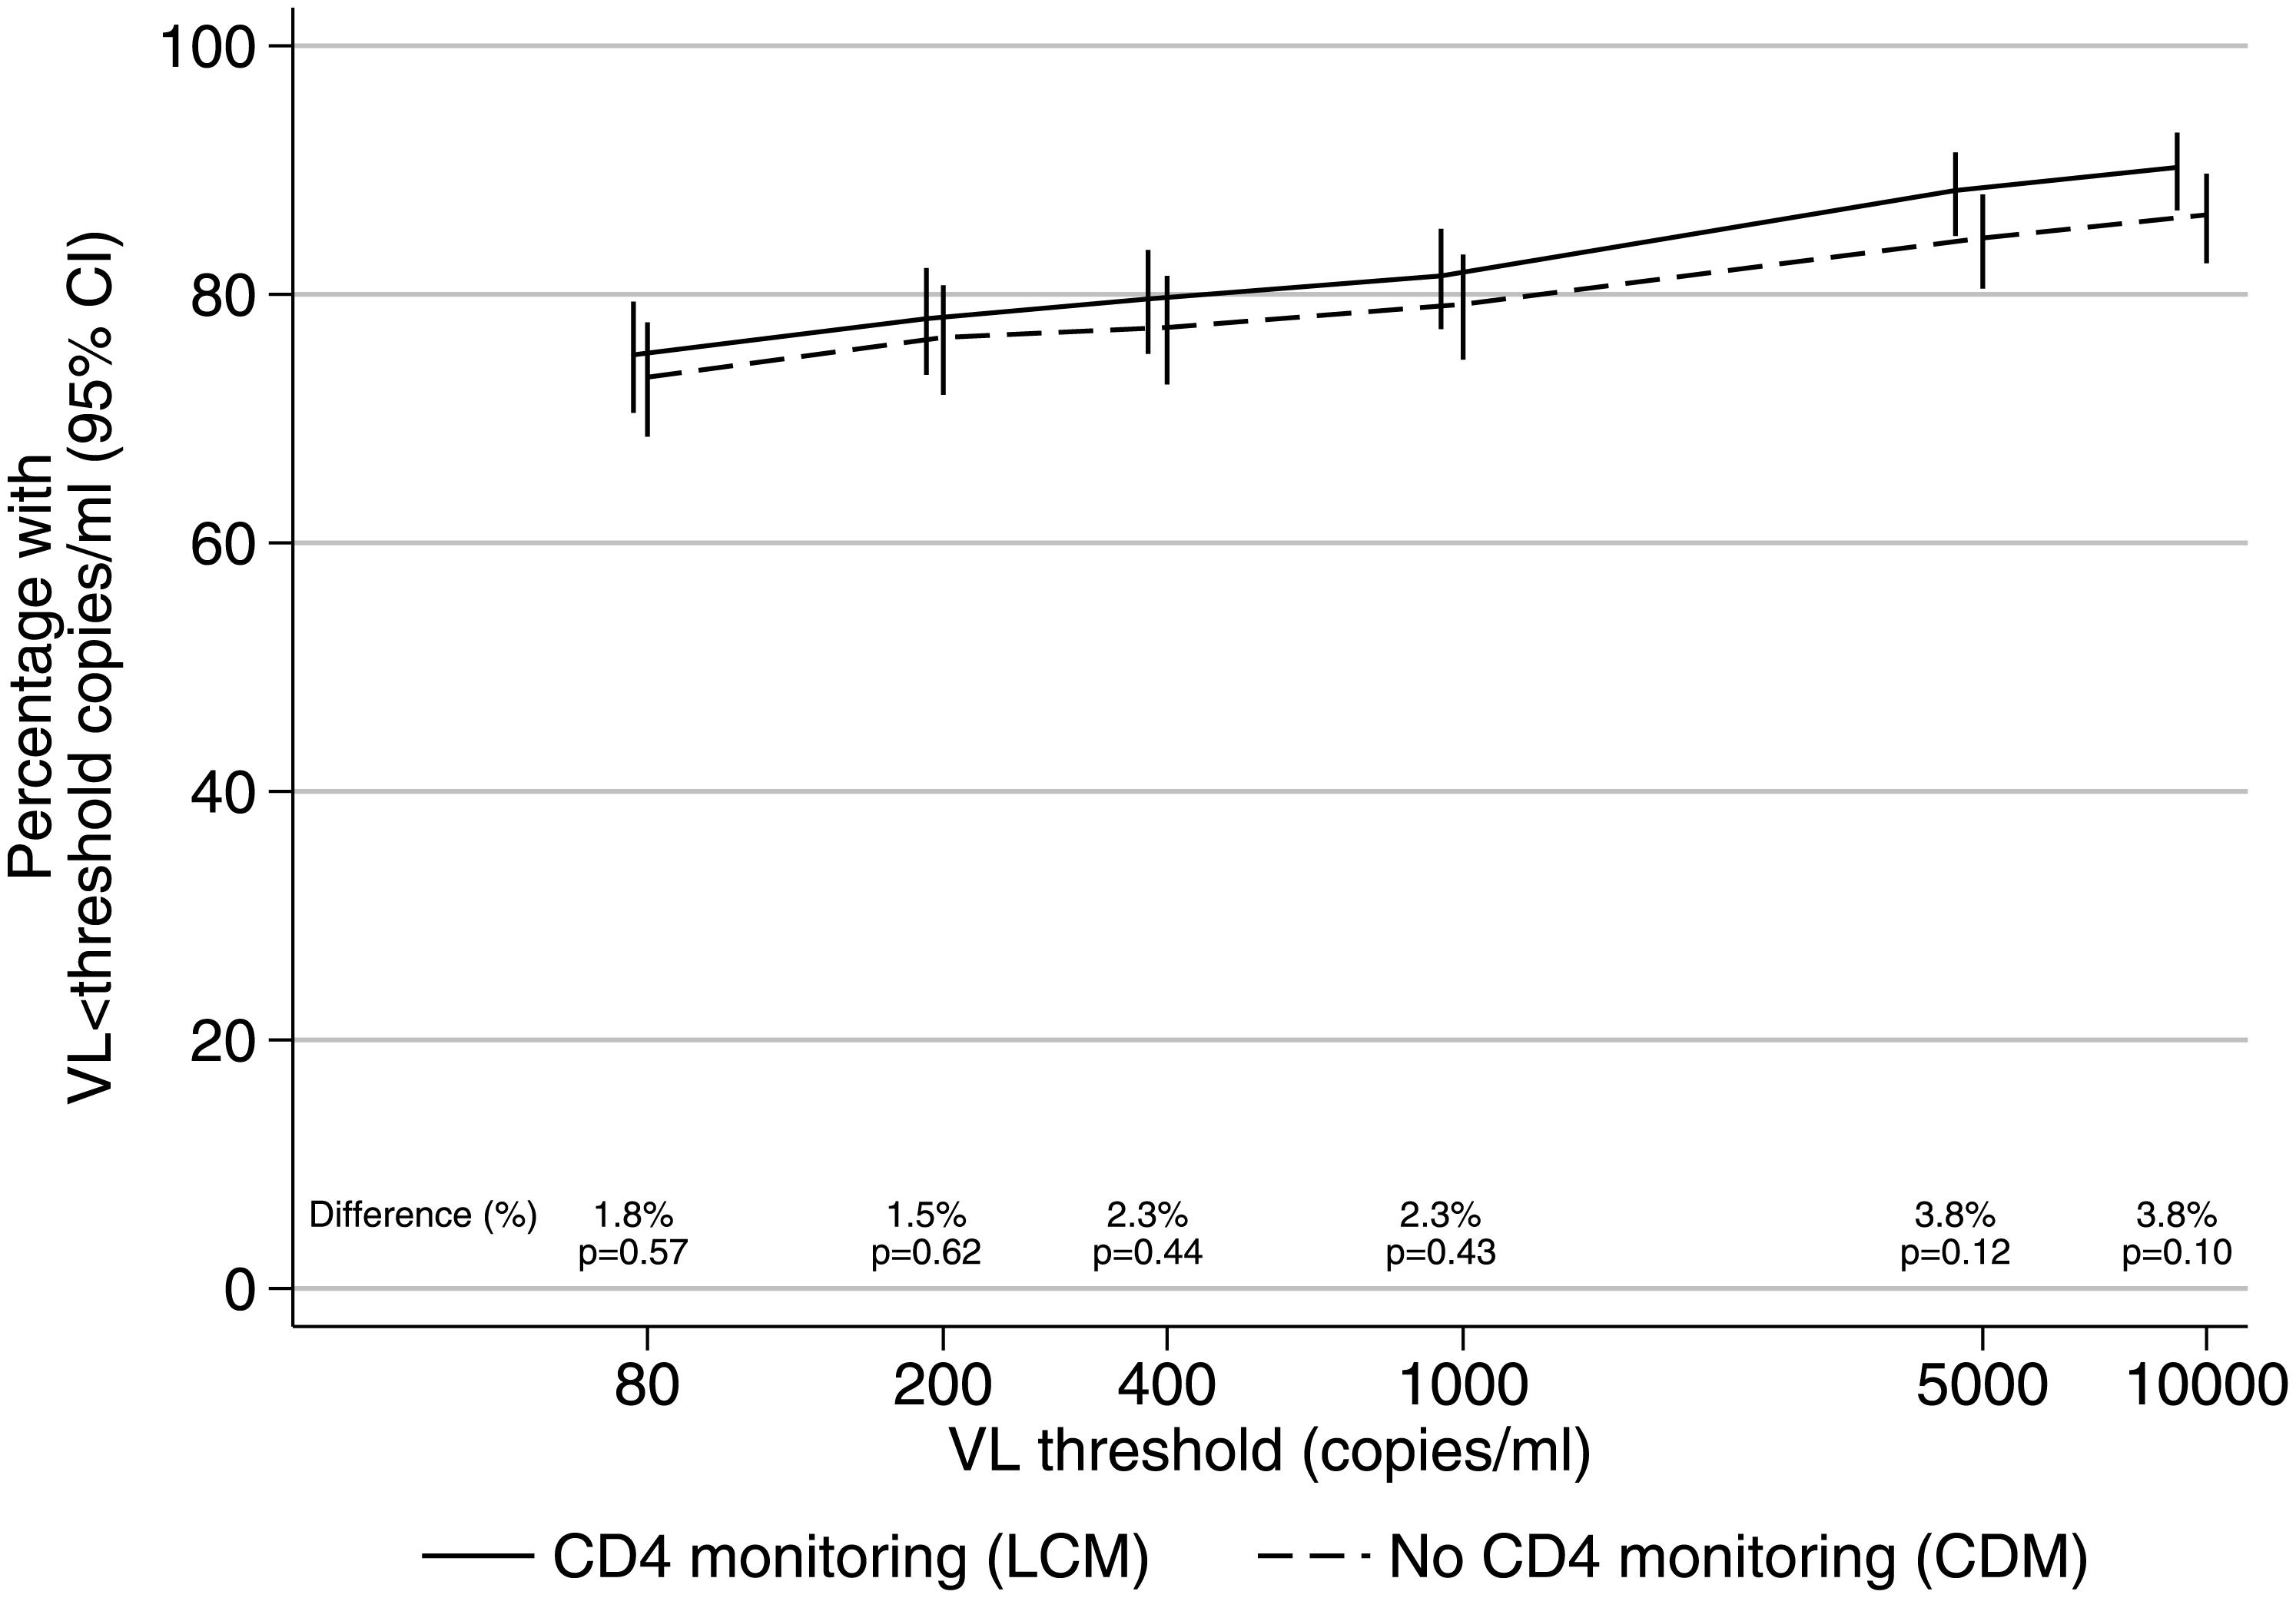 VL suppression in 2NRTI+NNRTI maintenance regimen after median 4 years on ART.